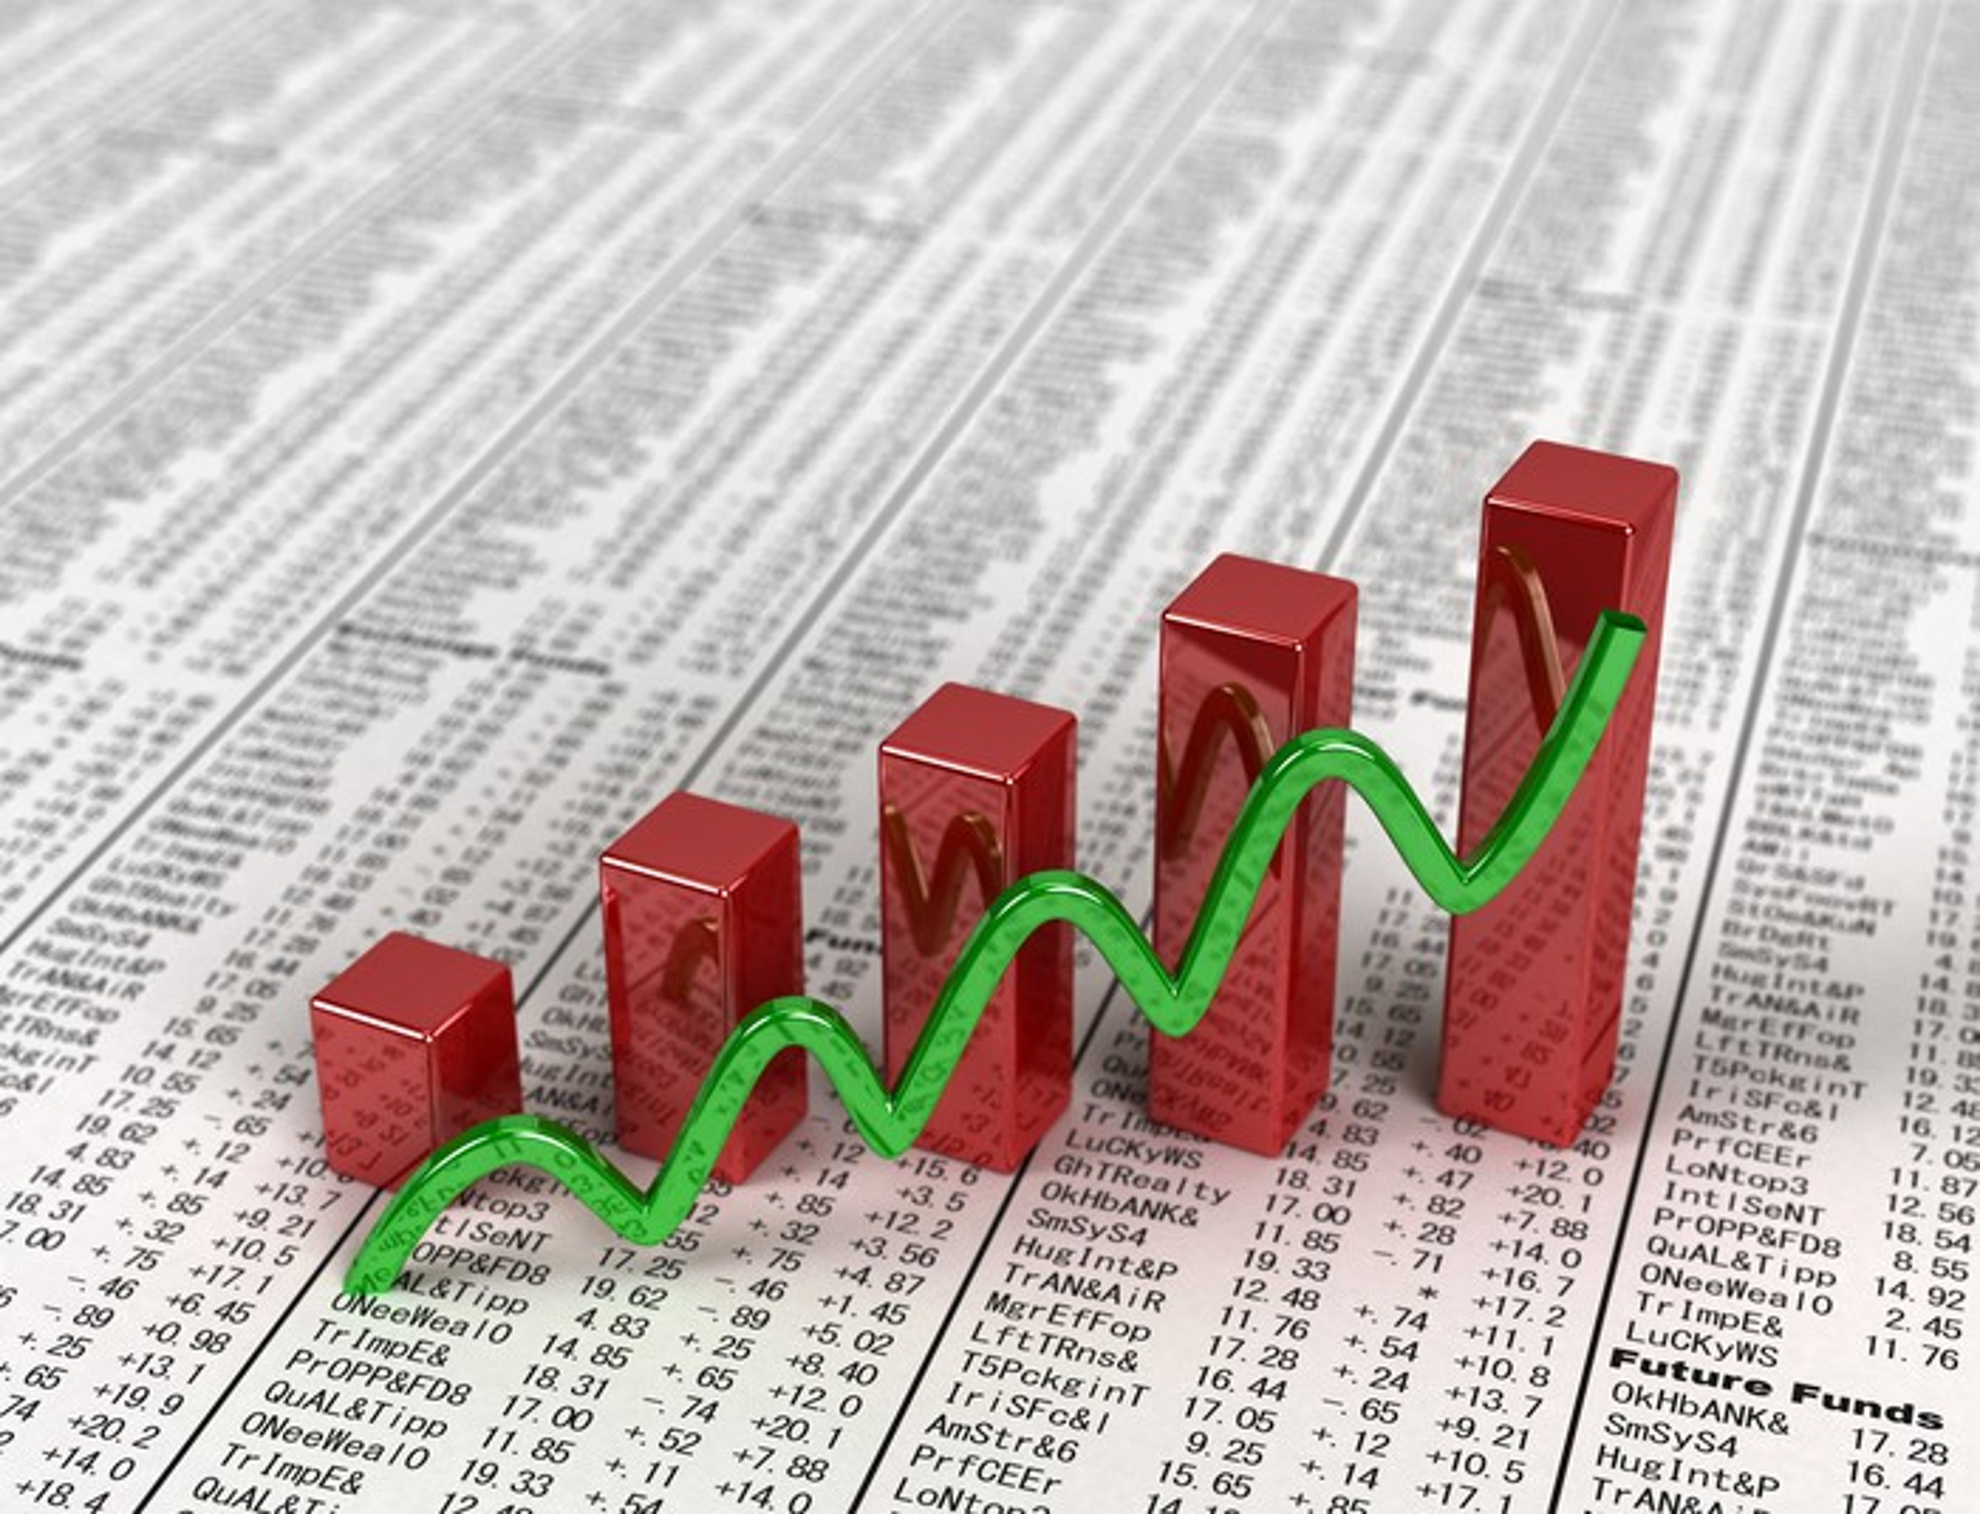 A rising bar chart lying atop a financial newspaper.